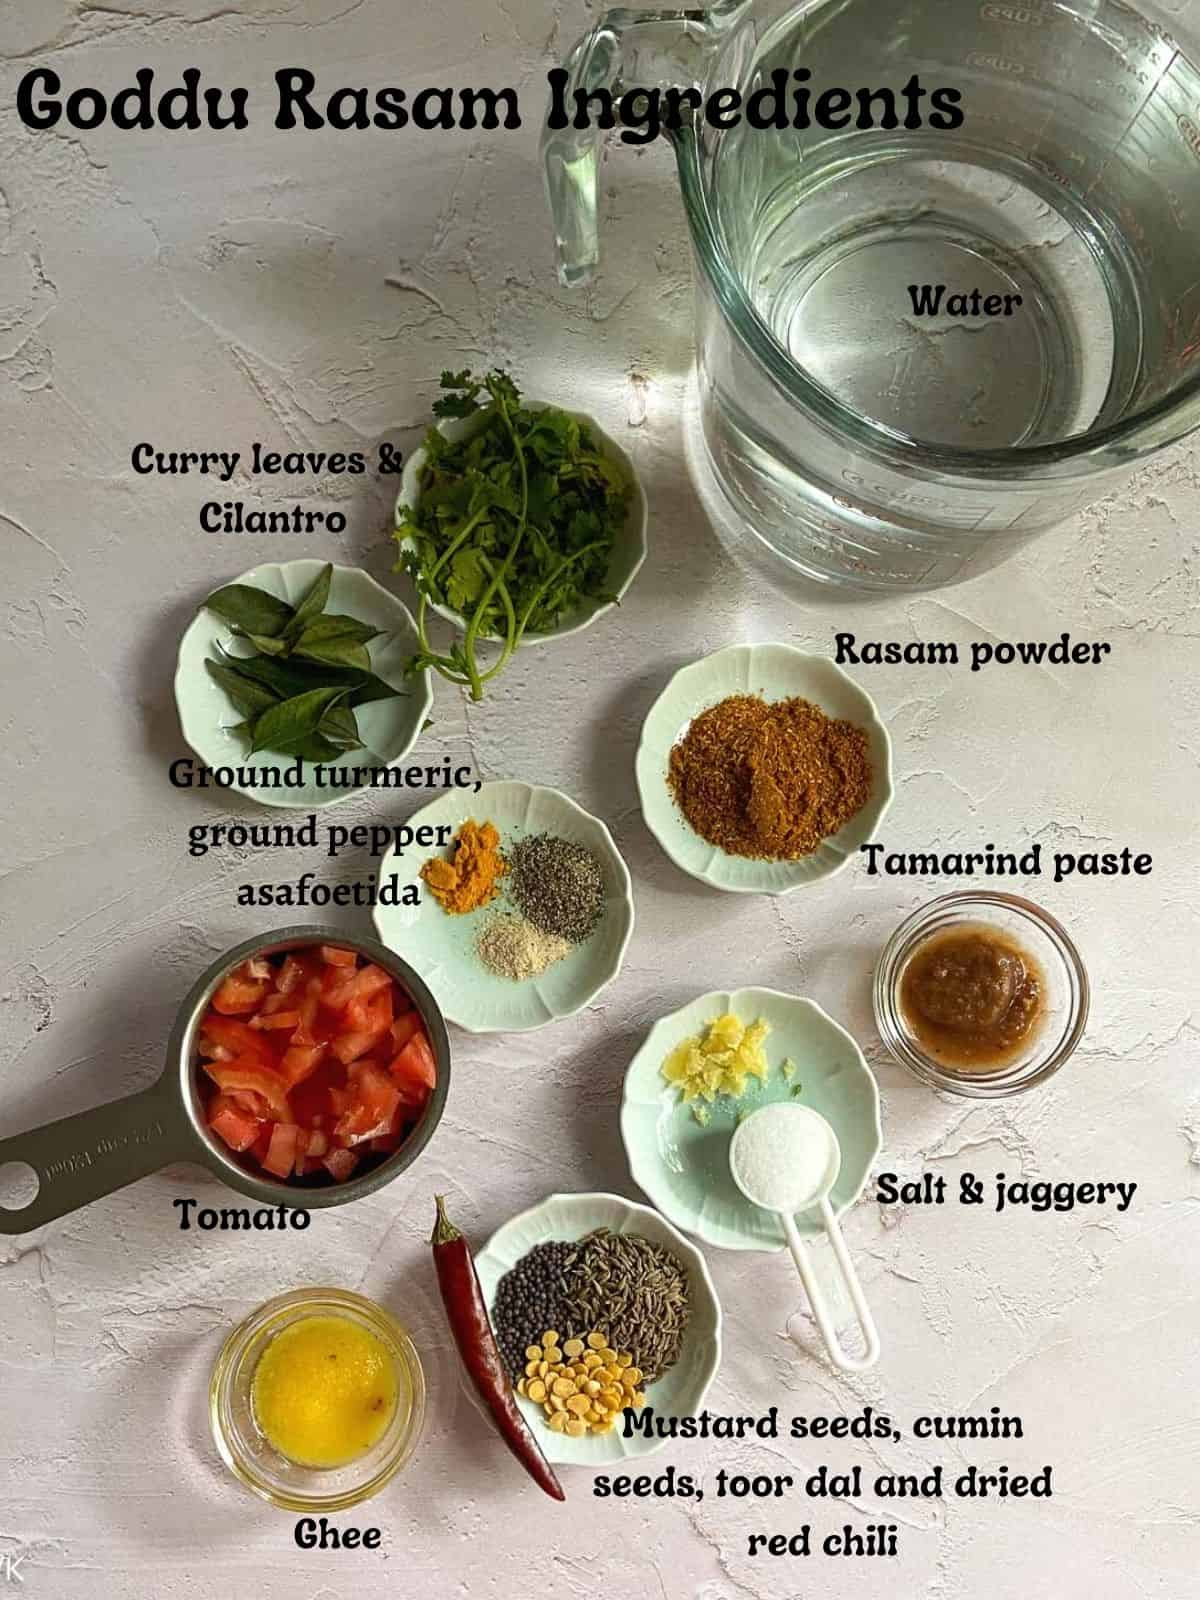 ingredients required for goddu rasam